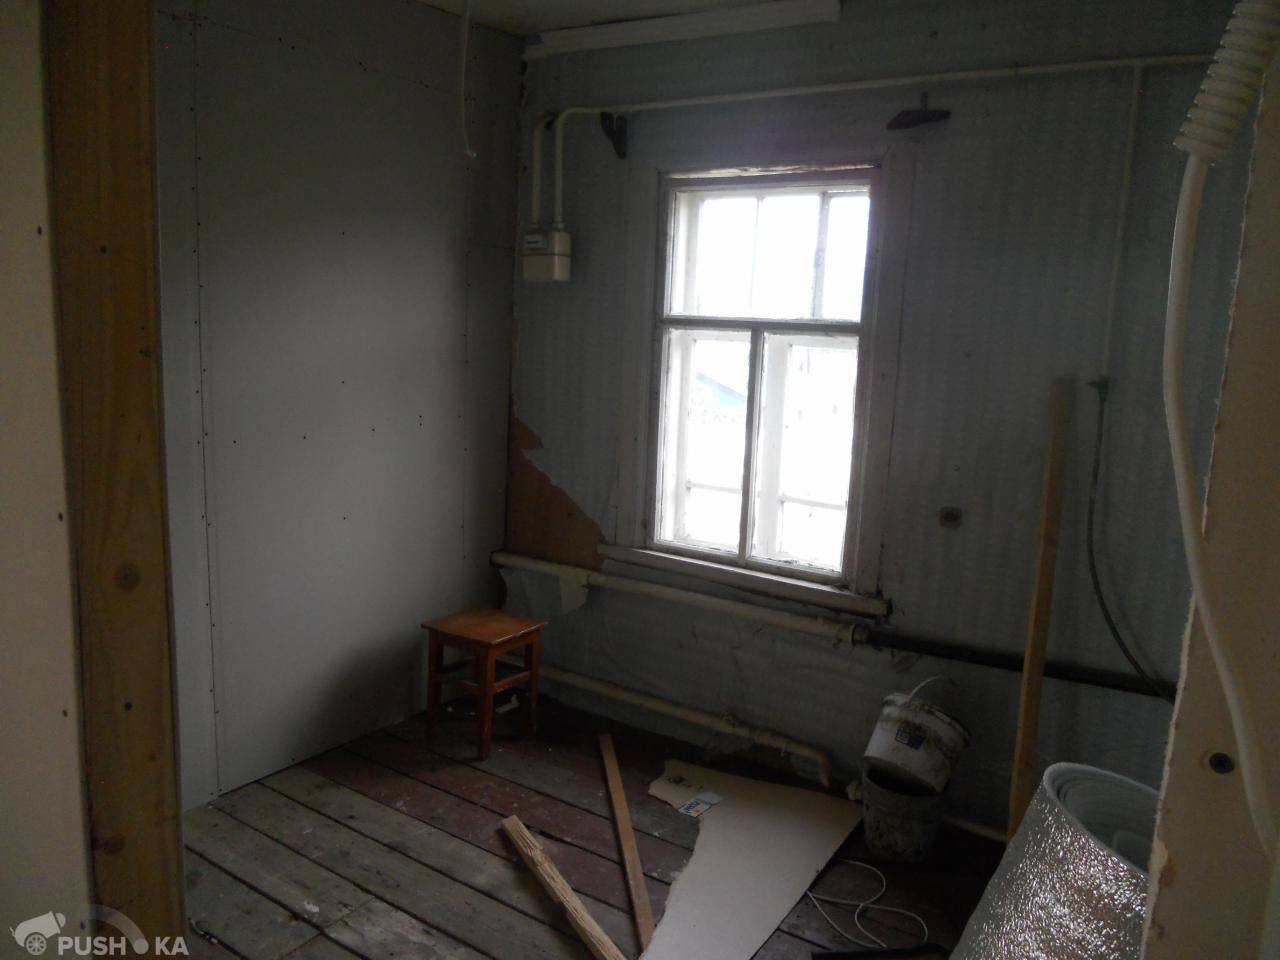 Продаётся 3-комнатная квартира 50.5 кв.м. этаж 1/1 за 550 000 руб